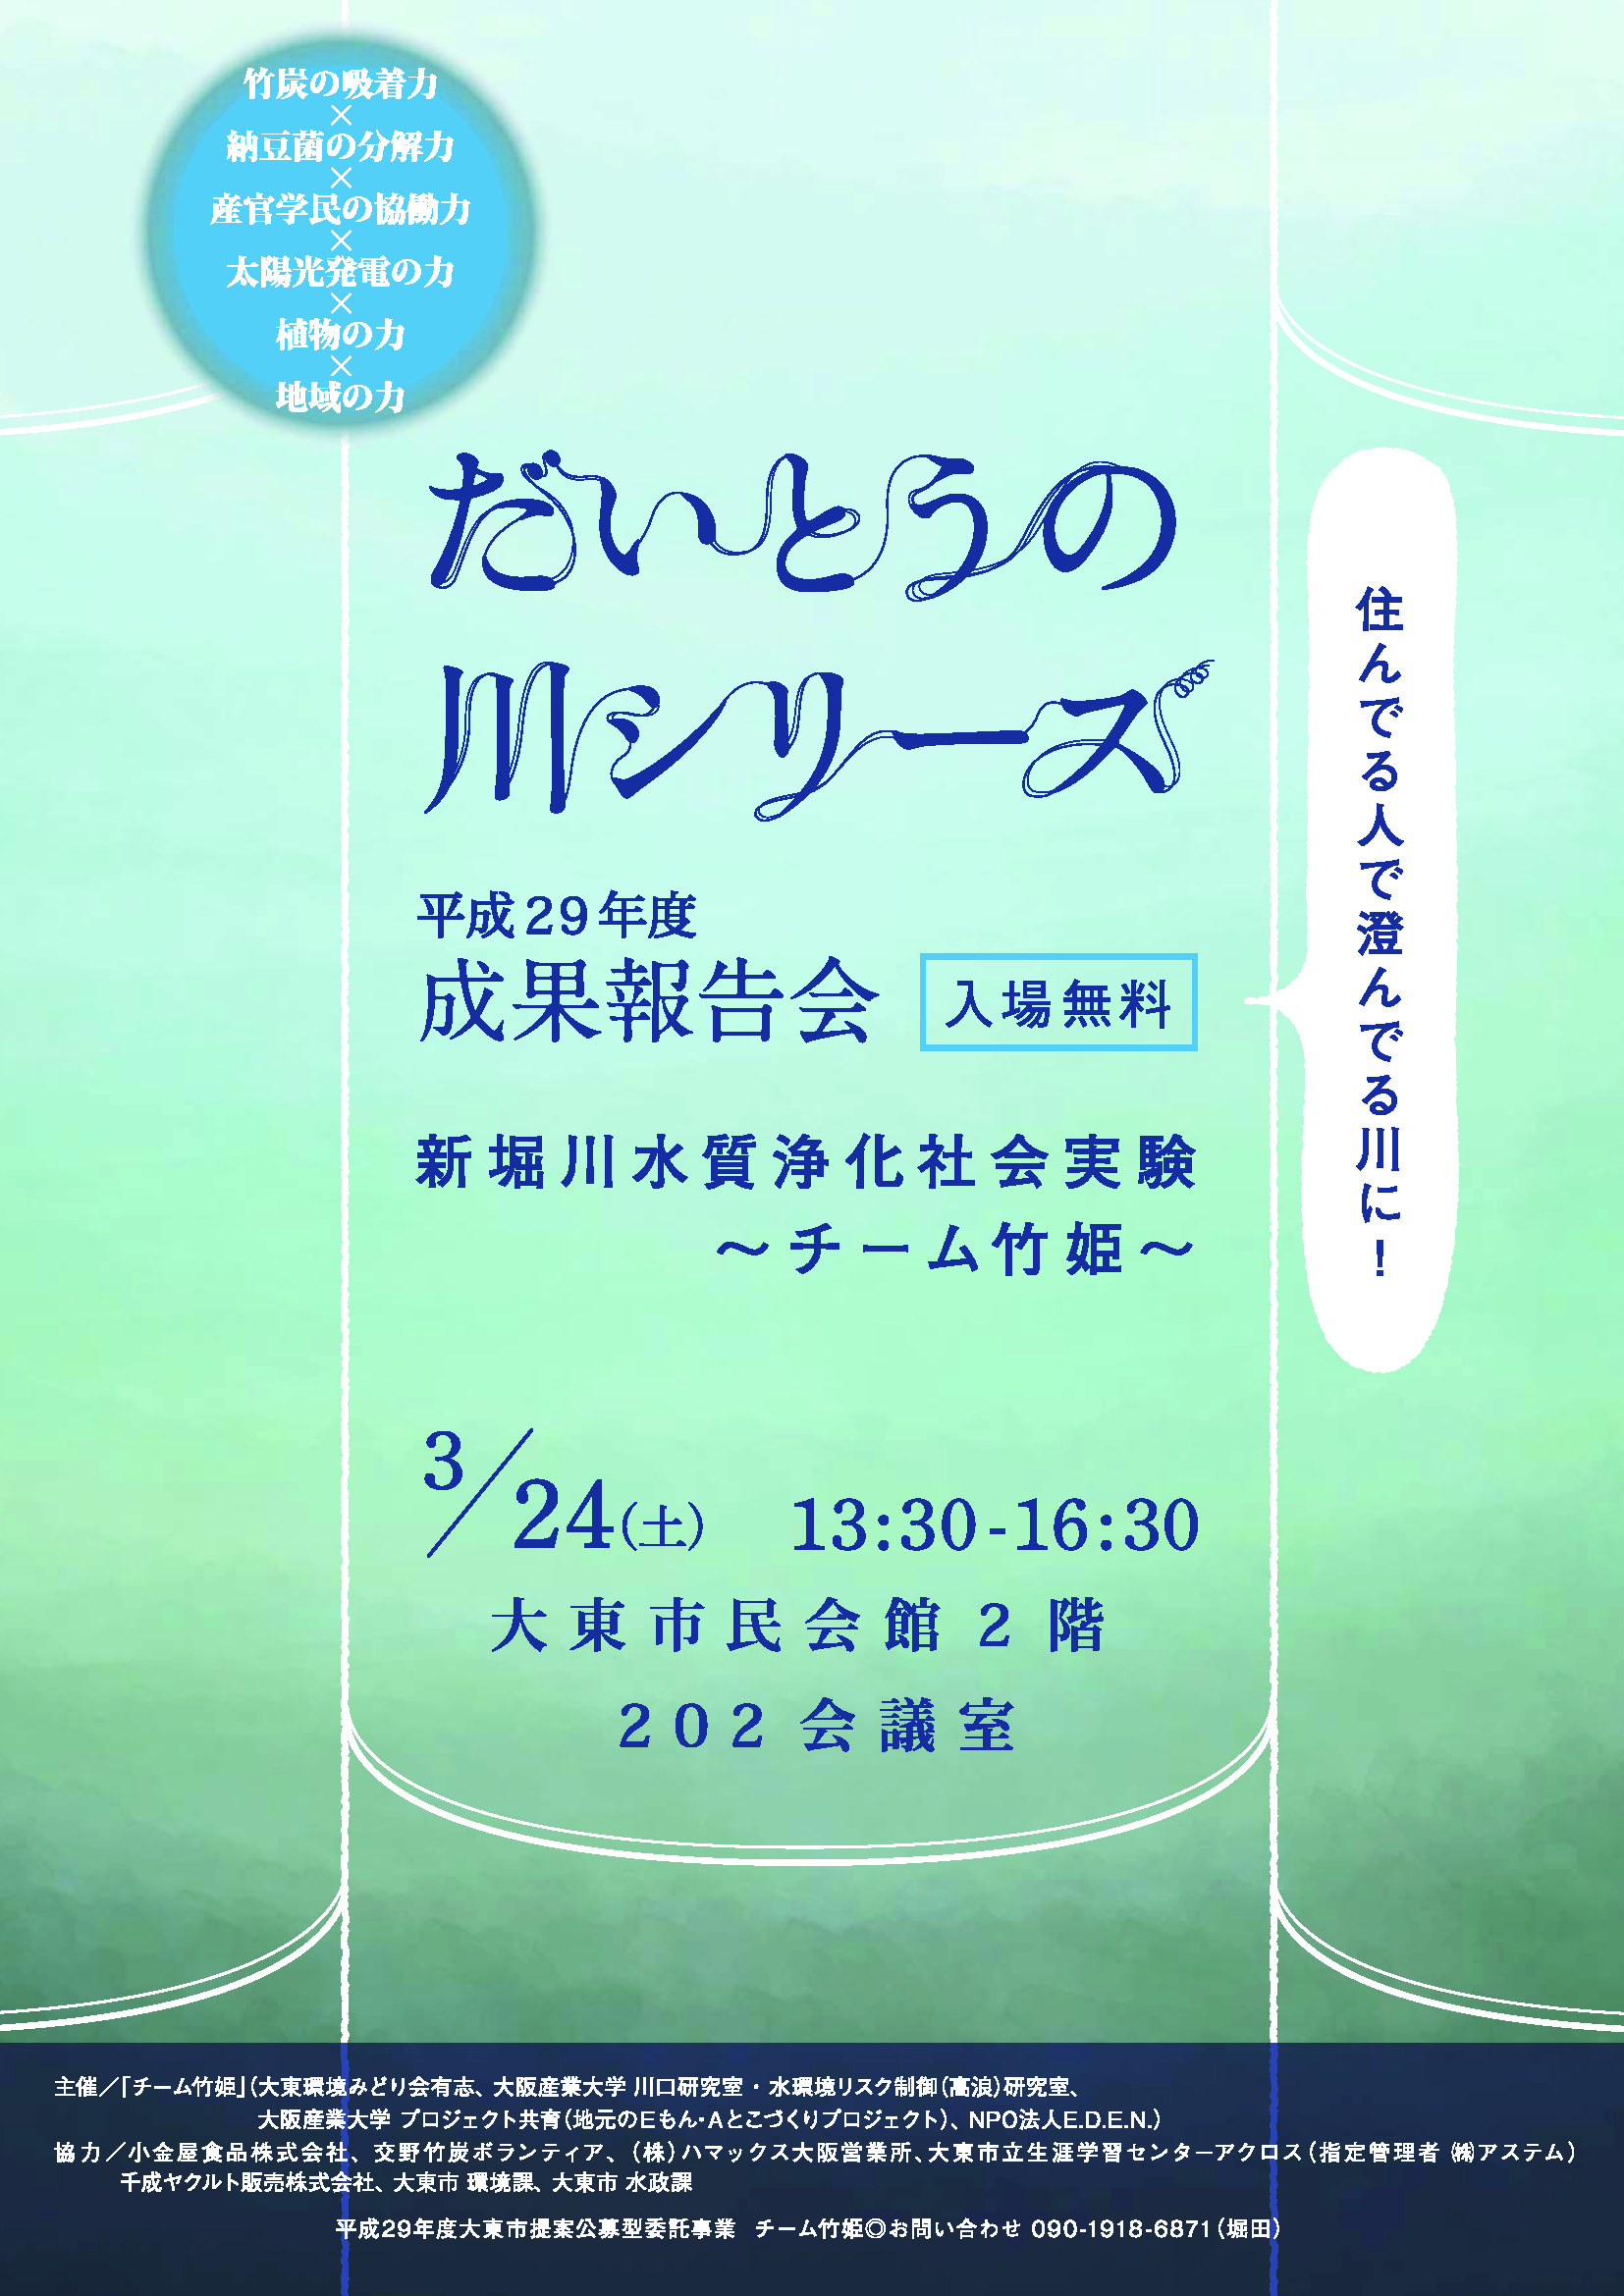 平成29年度水質浄化成果報告会チラシ完成版_ページ_1